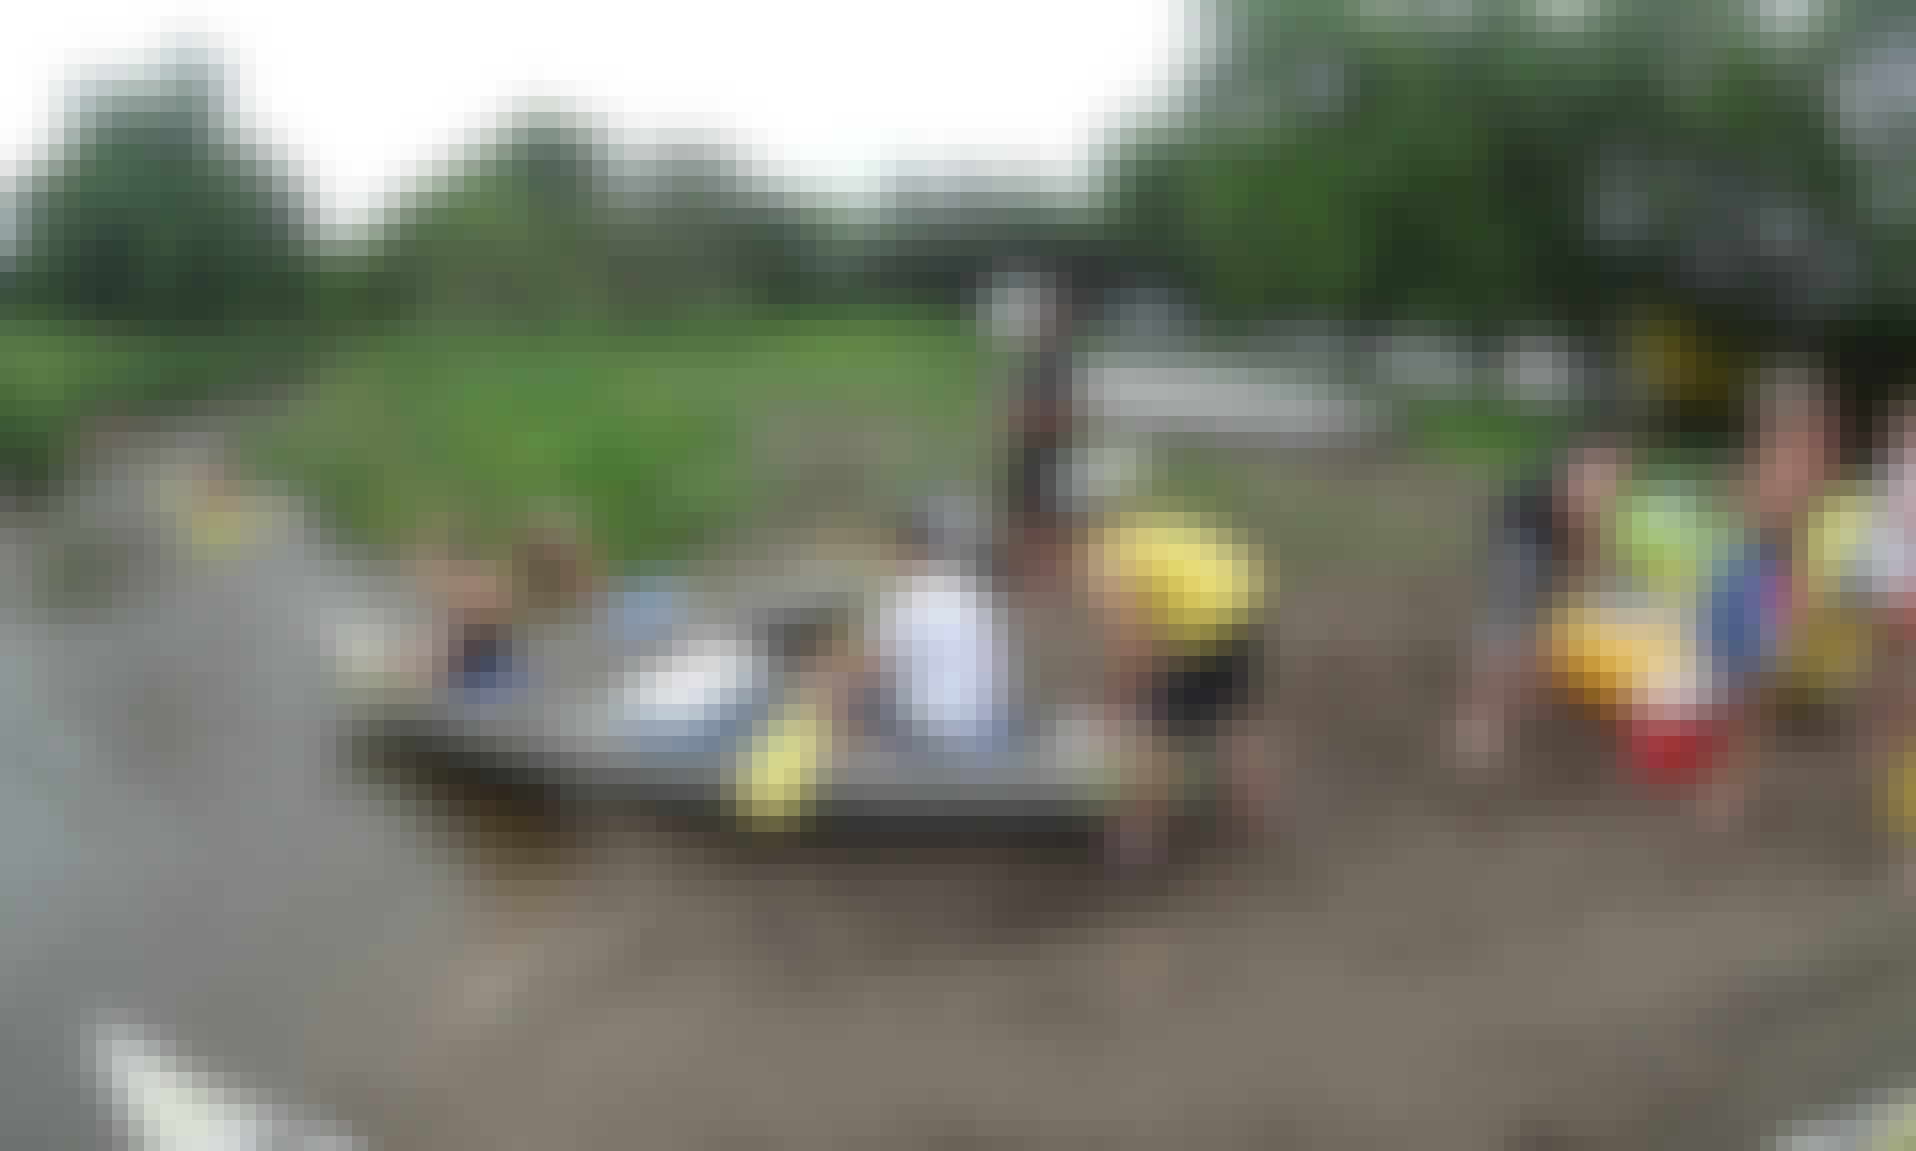 Explore the Kickapoo River on a Canoe!